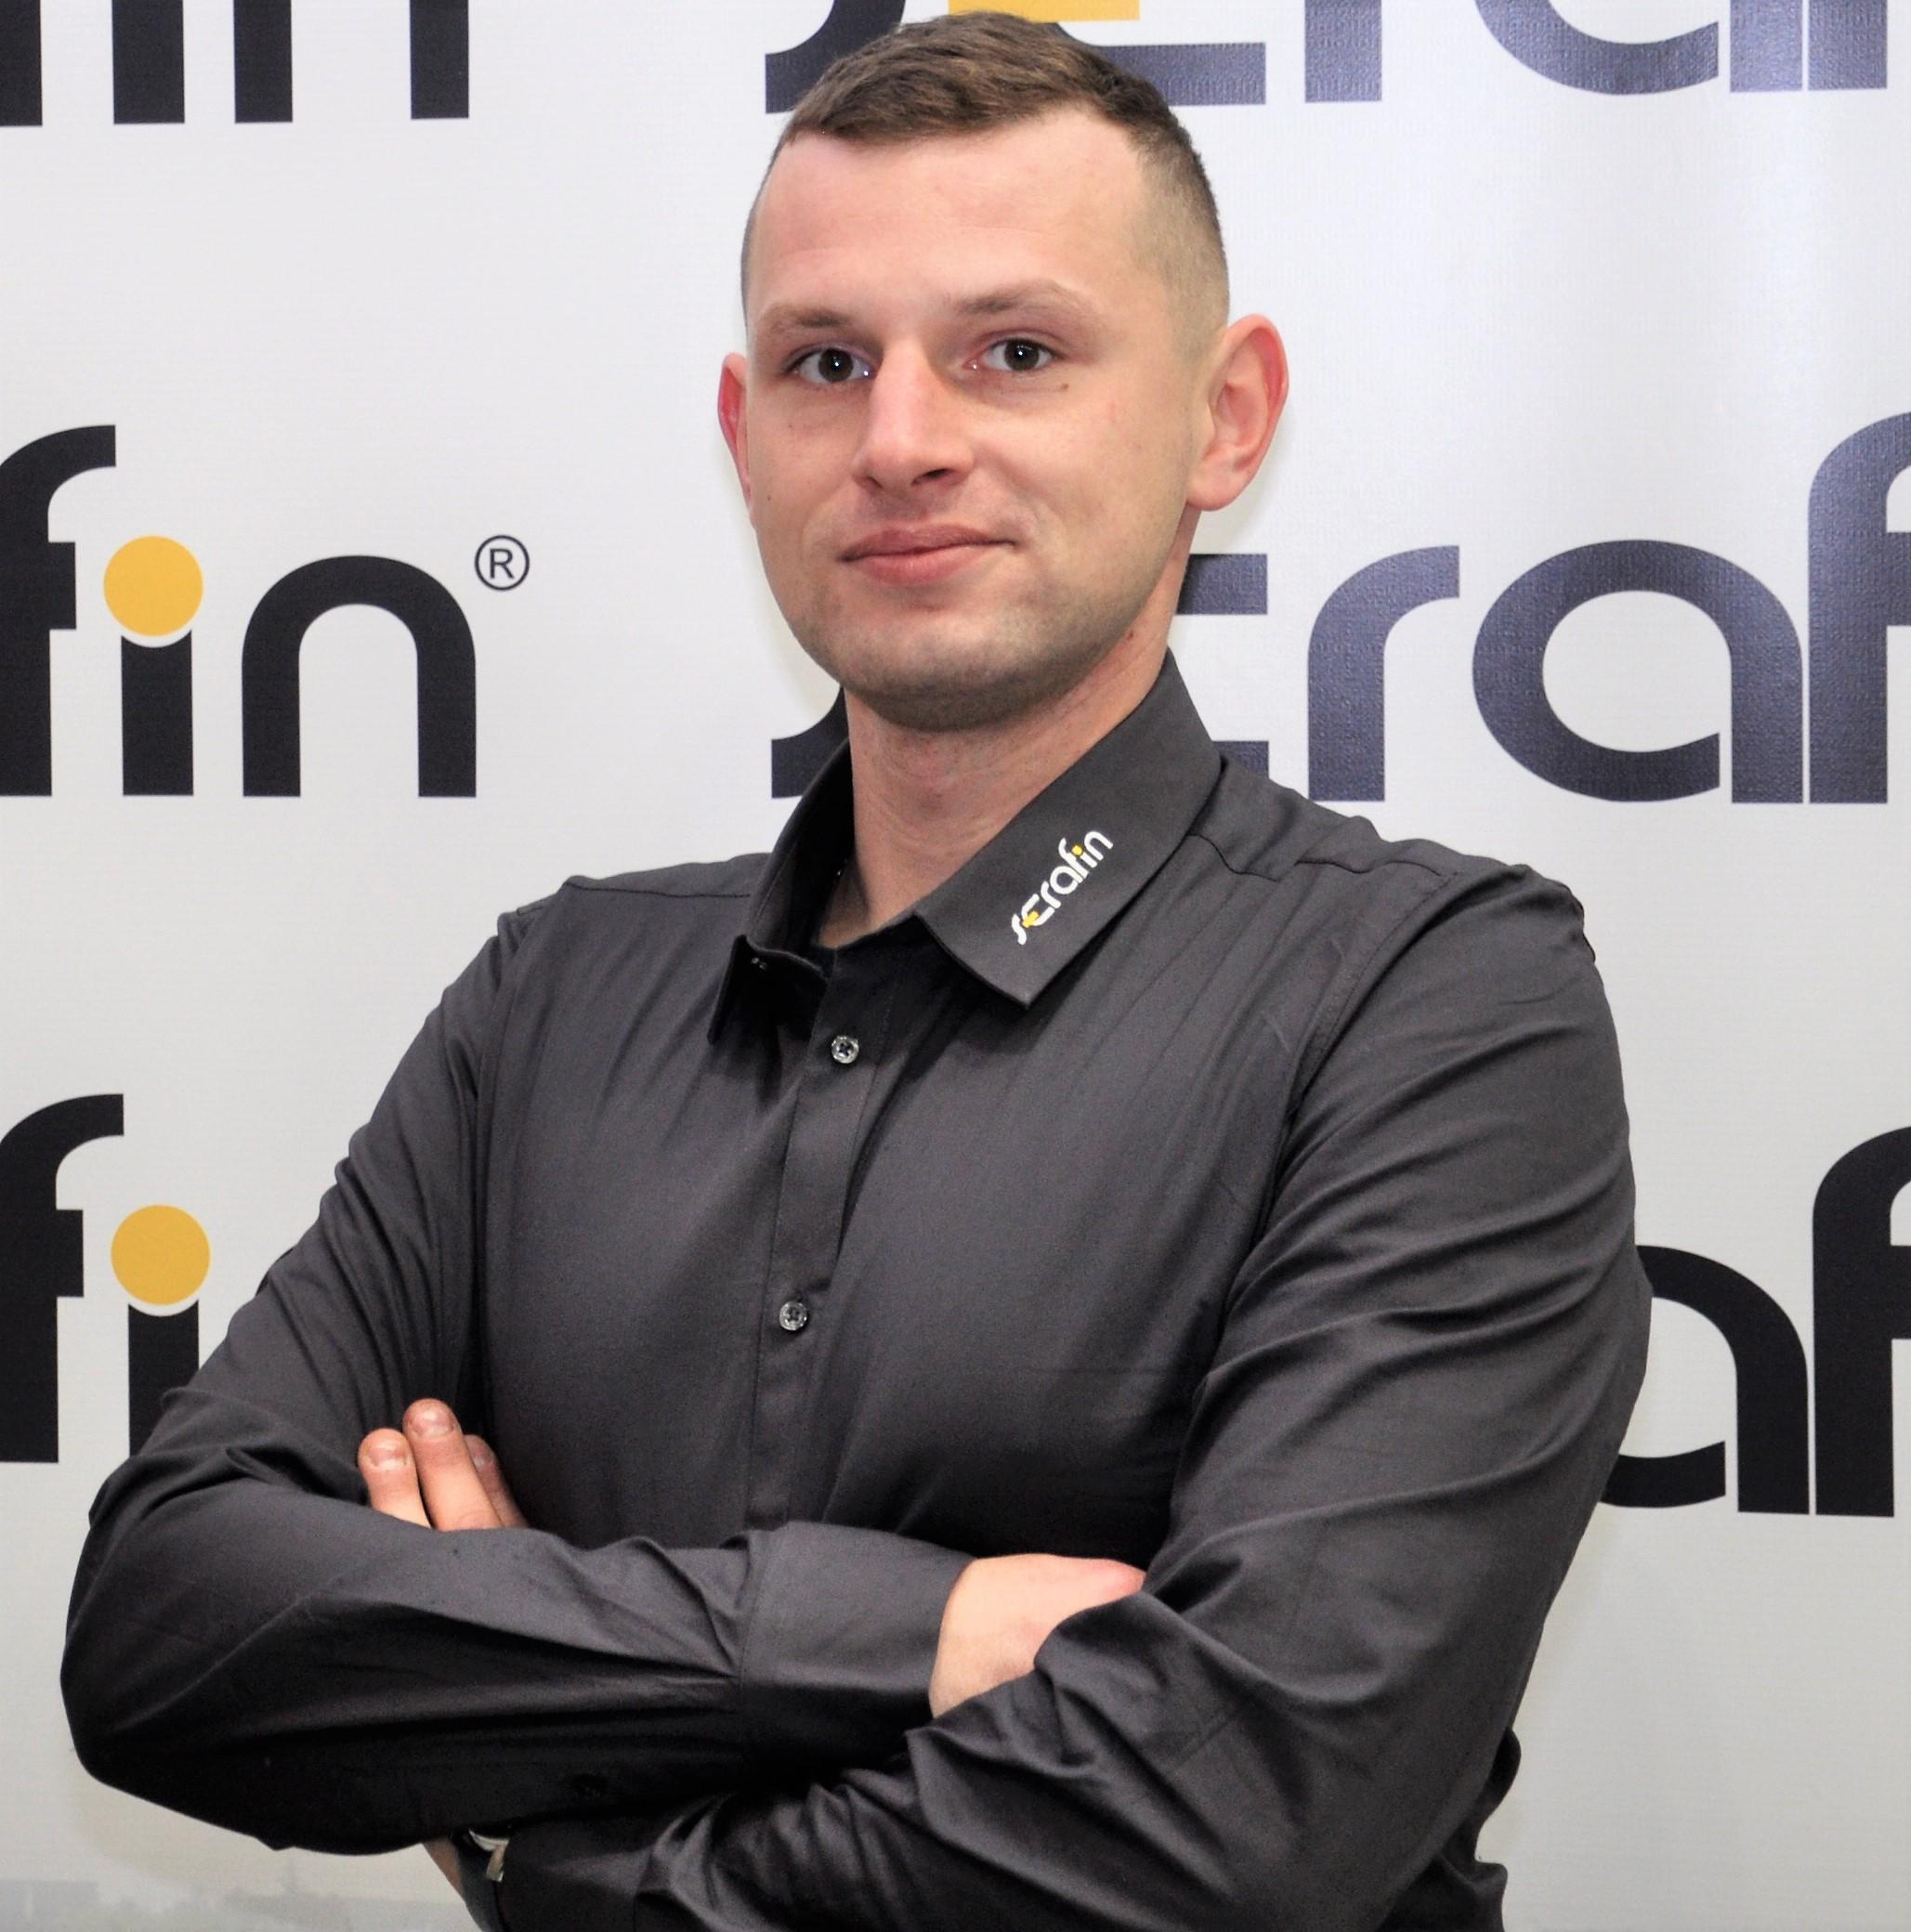 Damian Muzyk